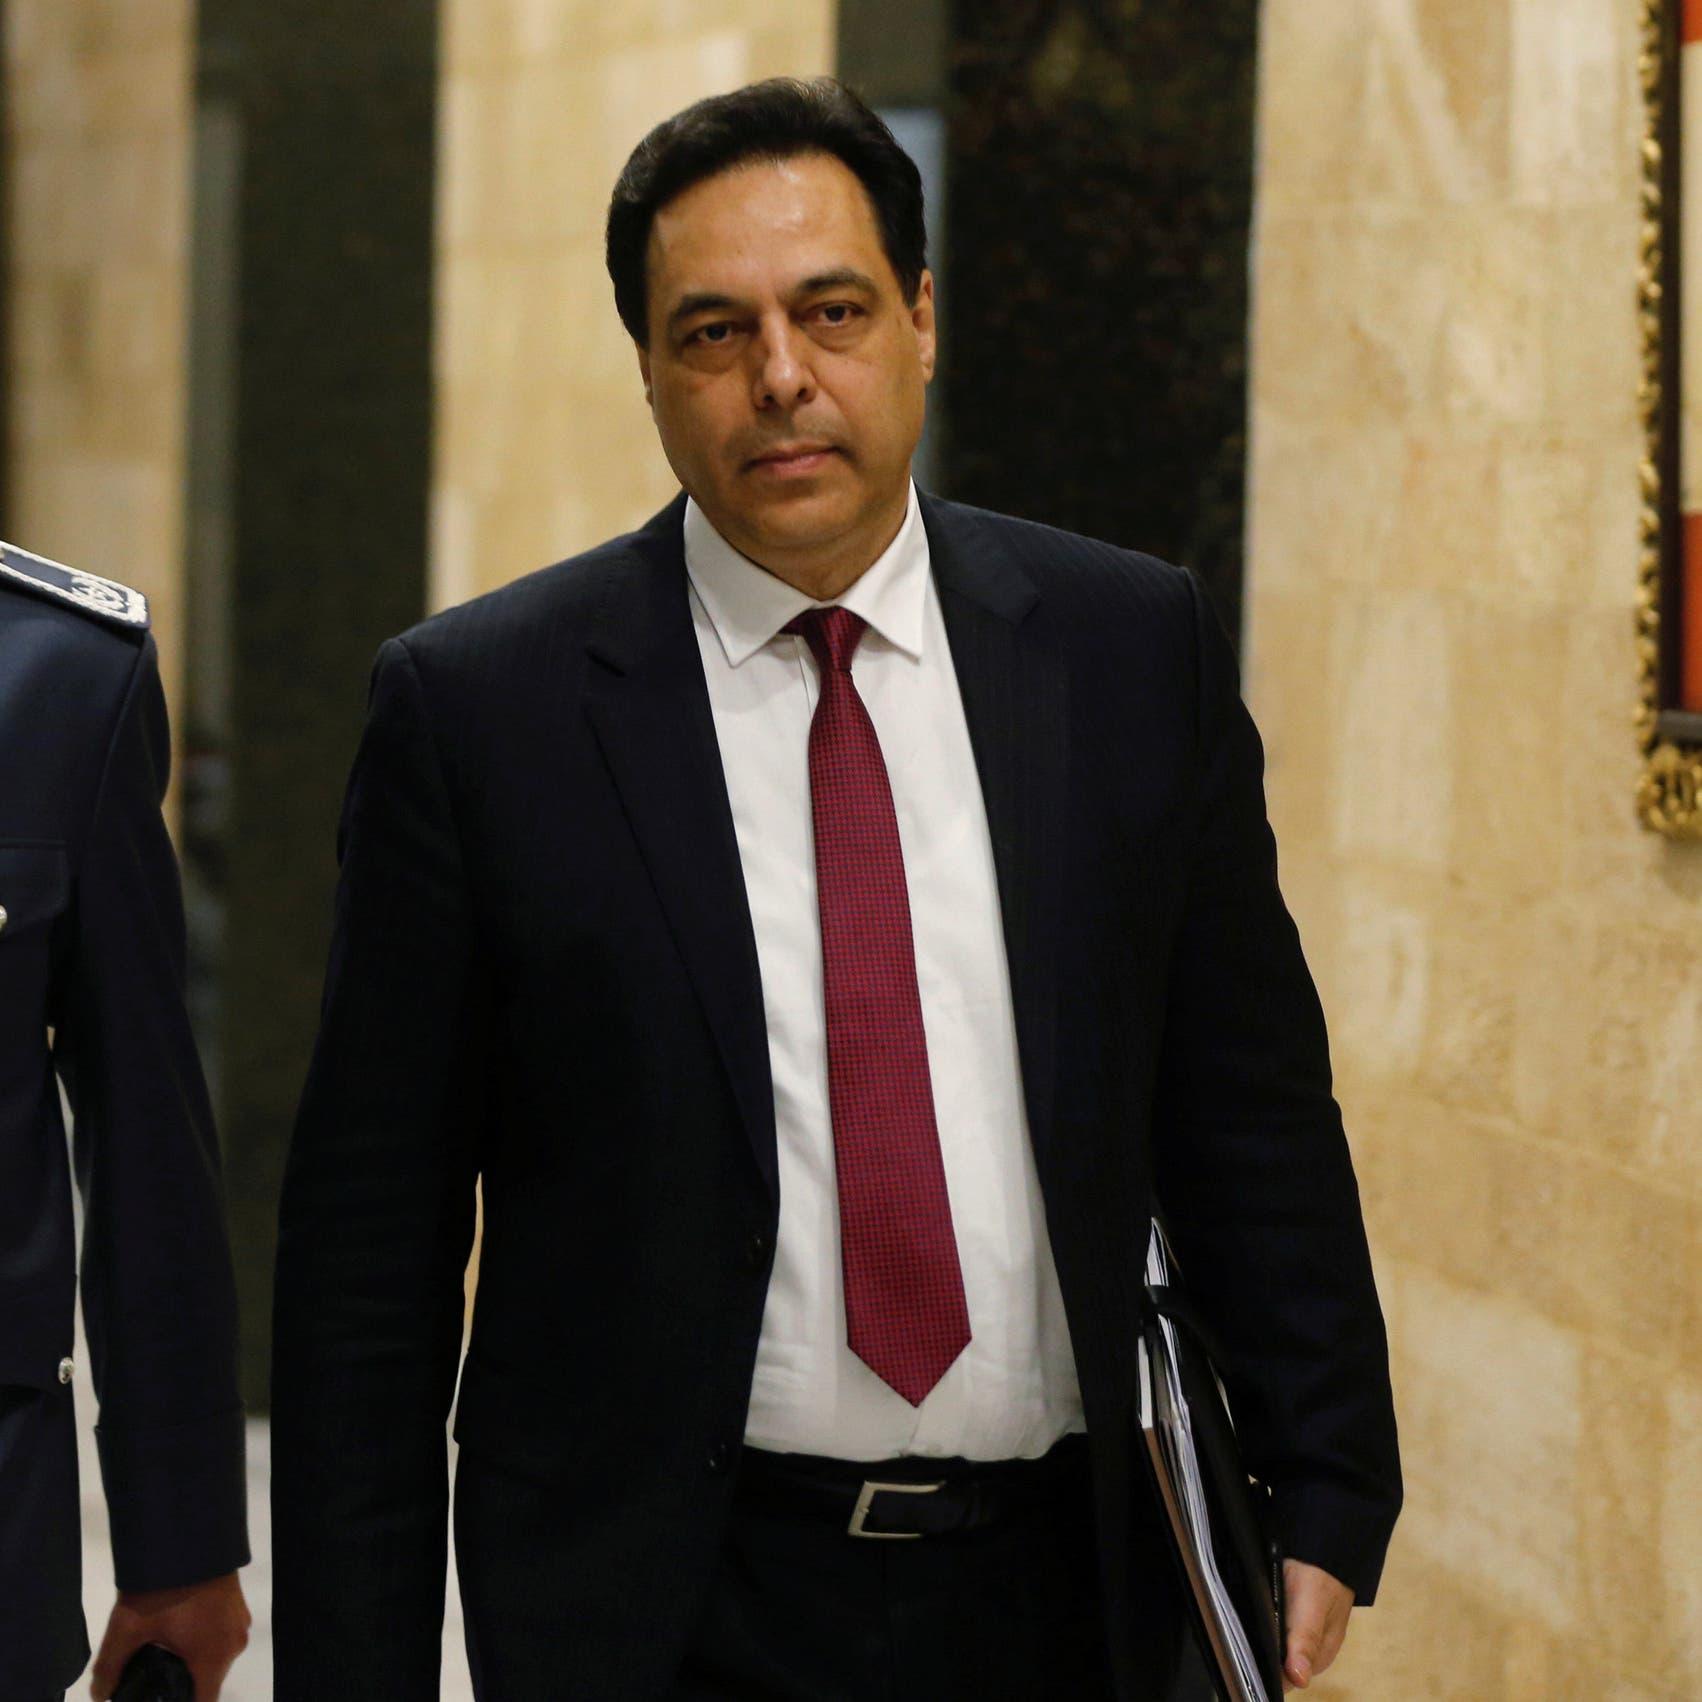 Lebanon's caretaker PM Diab says conscience is clear over Beirut port blast